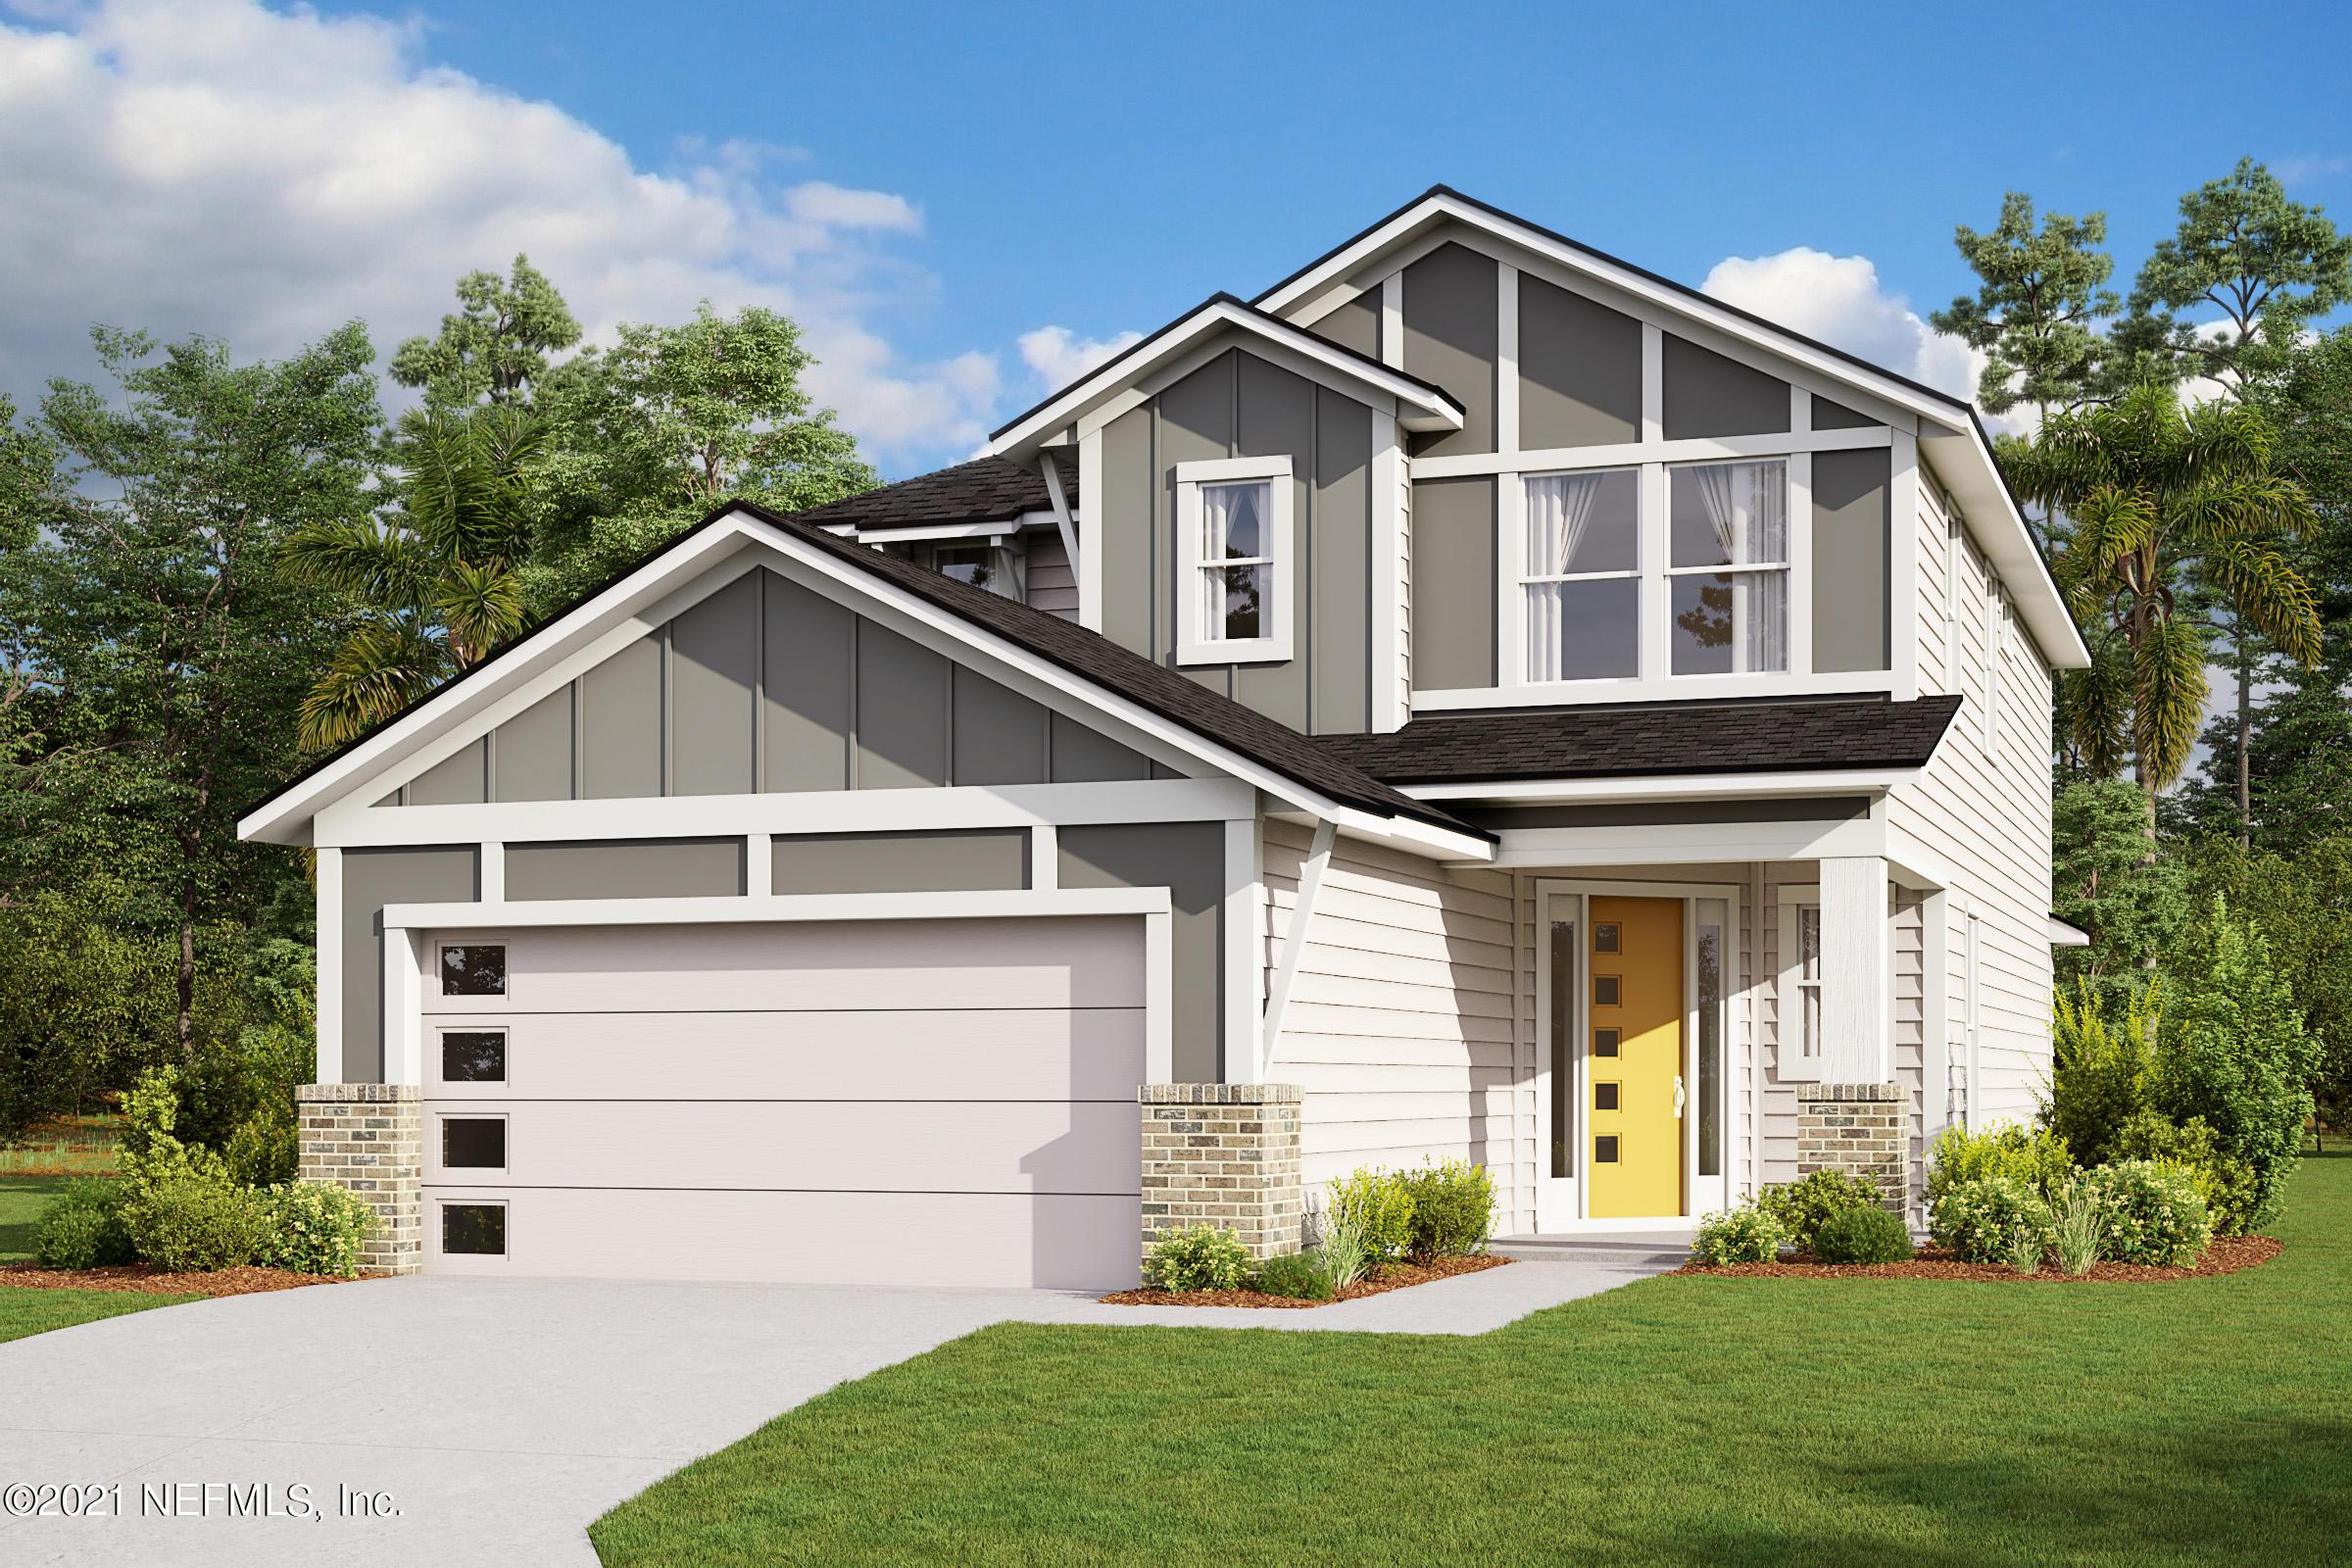 47 REUNION, PONTE VEDRA, FLORIDA 32081, 4 Bedrooms Bedrooms, ,3 BathroomsBathrooms,Residential,For sale,REUNION,1115648